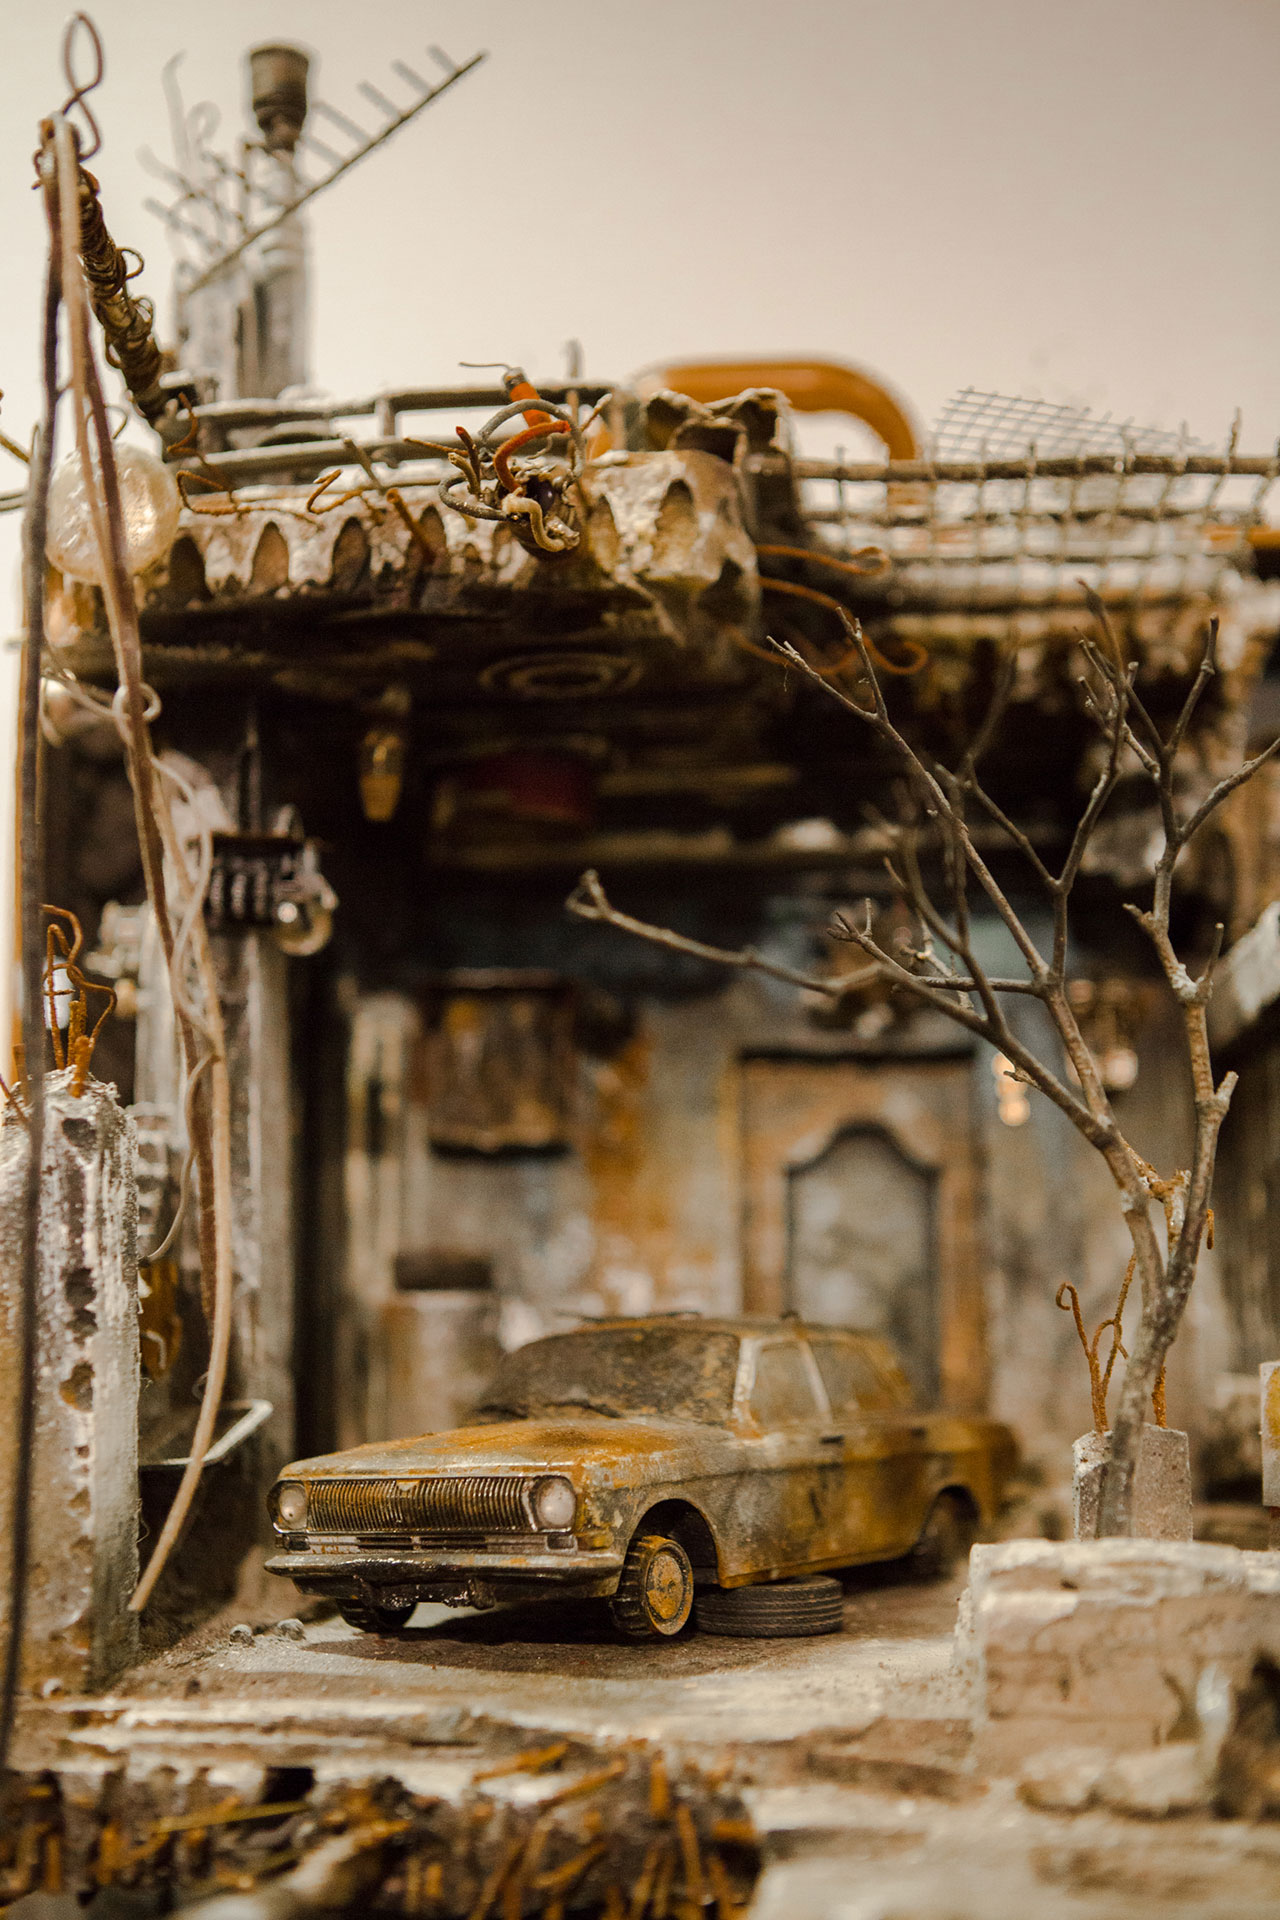 UM SHAHAM: War and a Burnt Car. Photo by Anisha Sisodia.